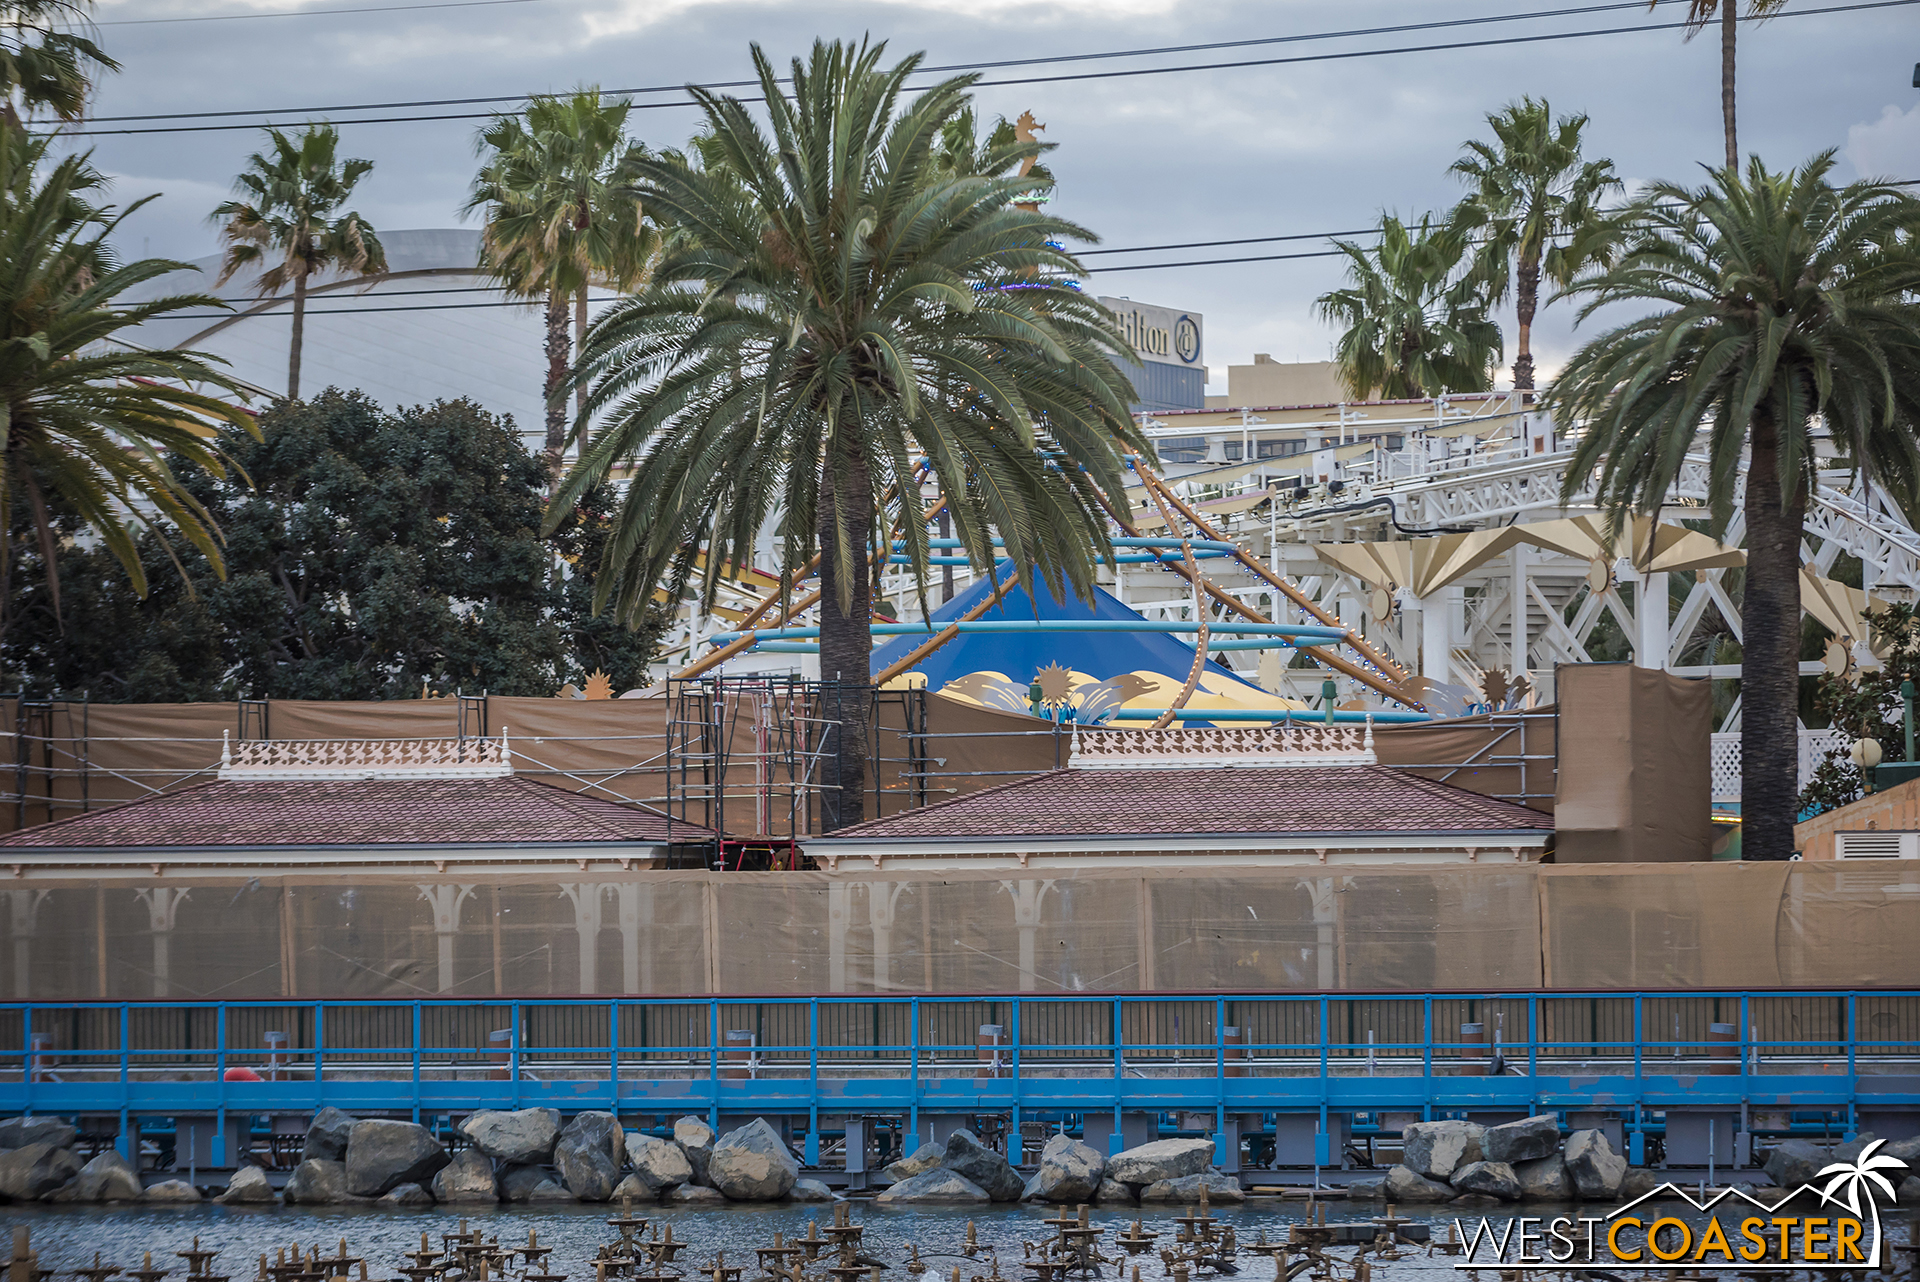 Triton's Carousel has closed.